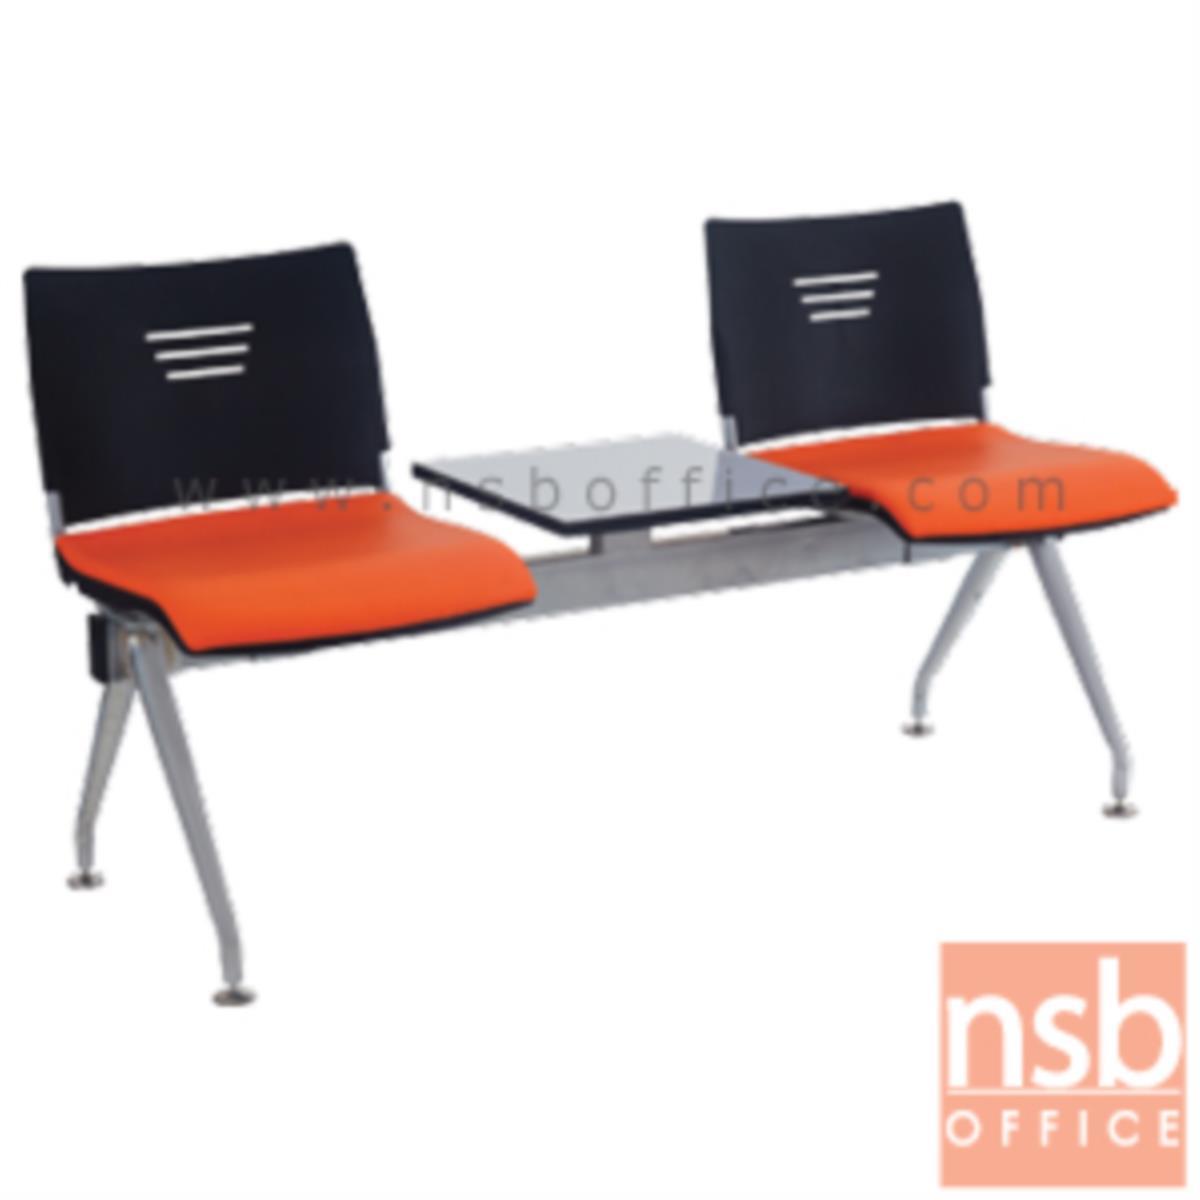 B06A114:เก้าอี้นั่งคอยเฟรมโพลี่หุ้มเบาะ  รุ่น Redcliffe (เรดคลิฟ) 2 ,3 ที่นั่ง ขนาด 140W ,195W cm. พร้อมที่วางของ ขาเหล็ก